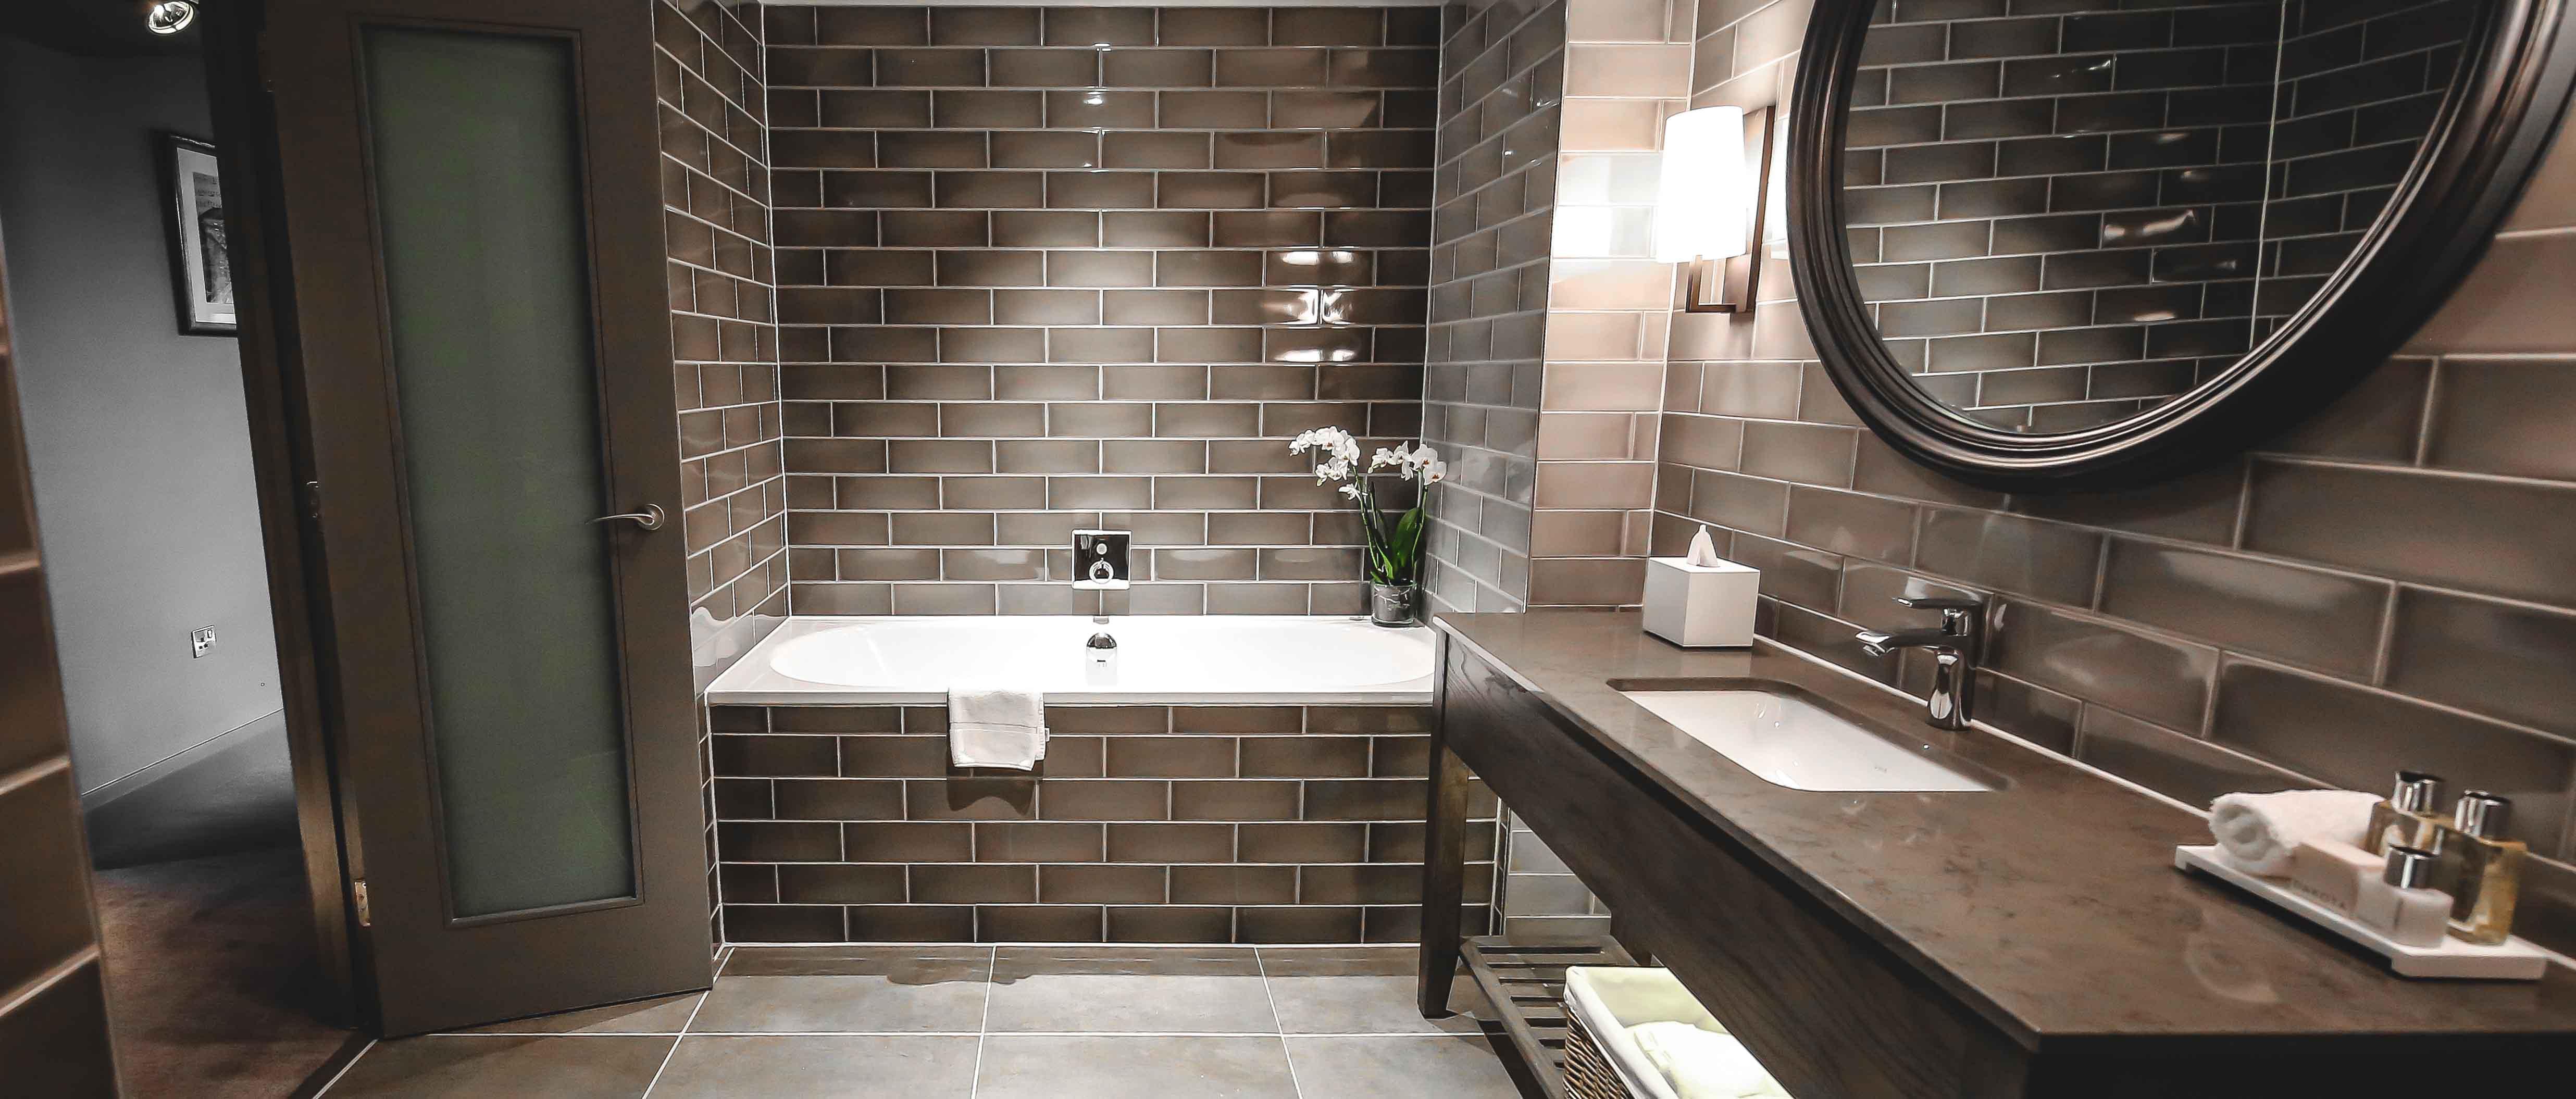 Dakota Glasgow bathroom suite